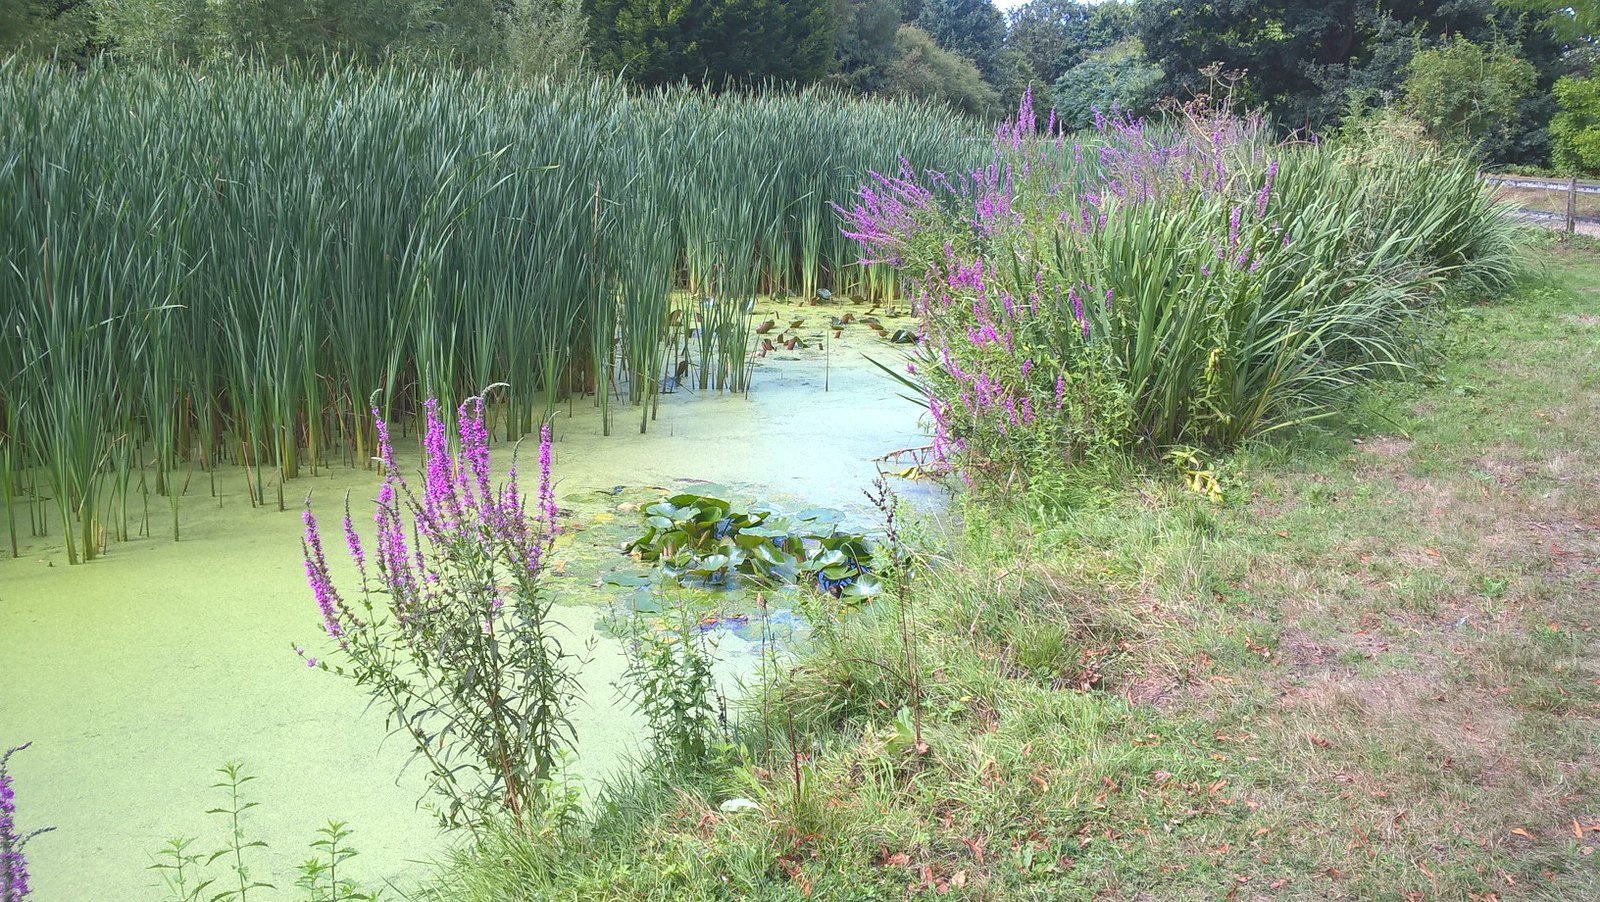 Pond Life on the Manningtree Circular walk